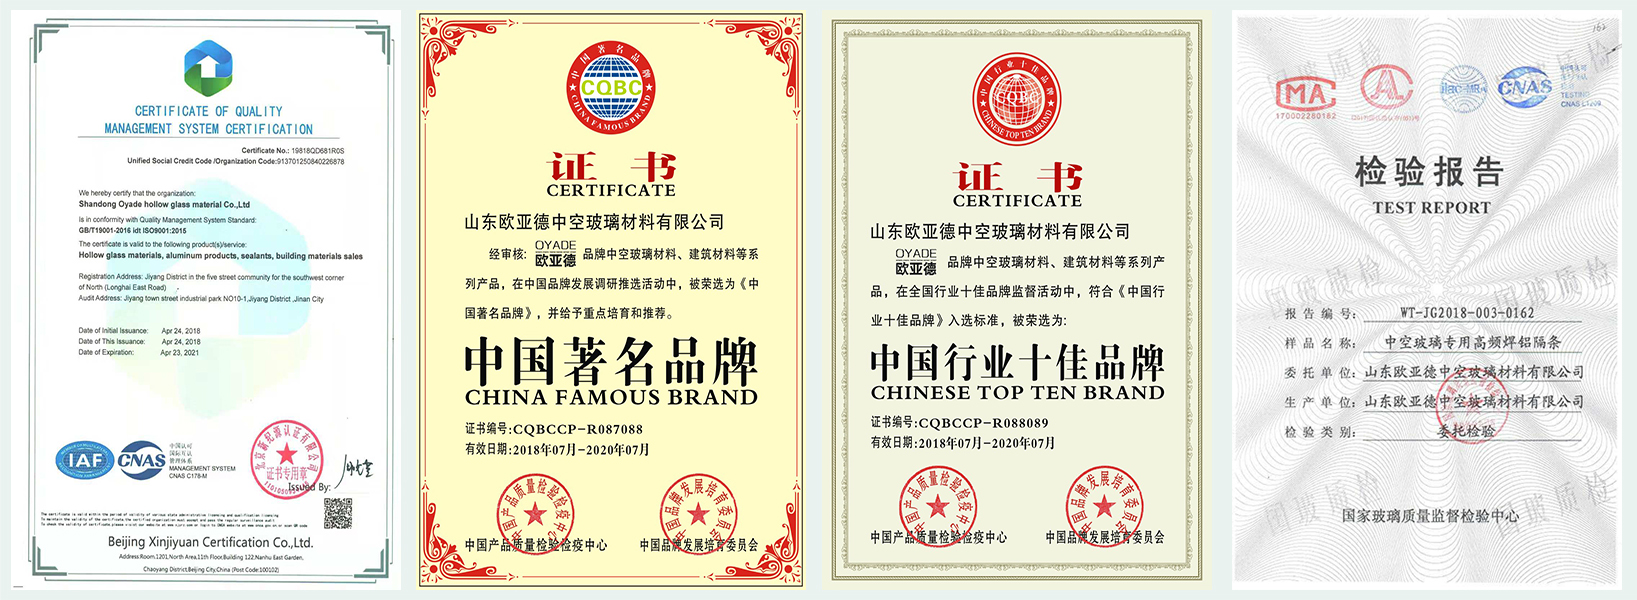 OYADE Certification.jpg